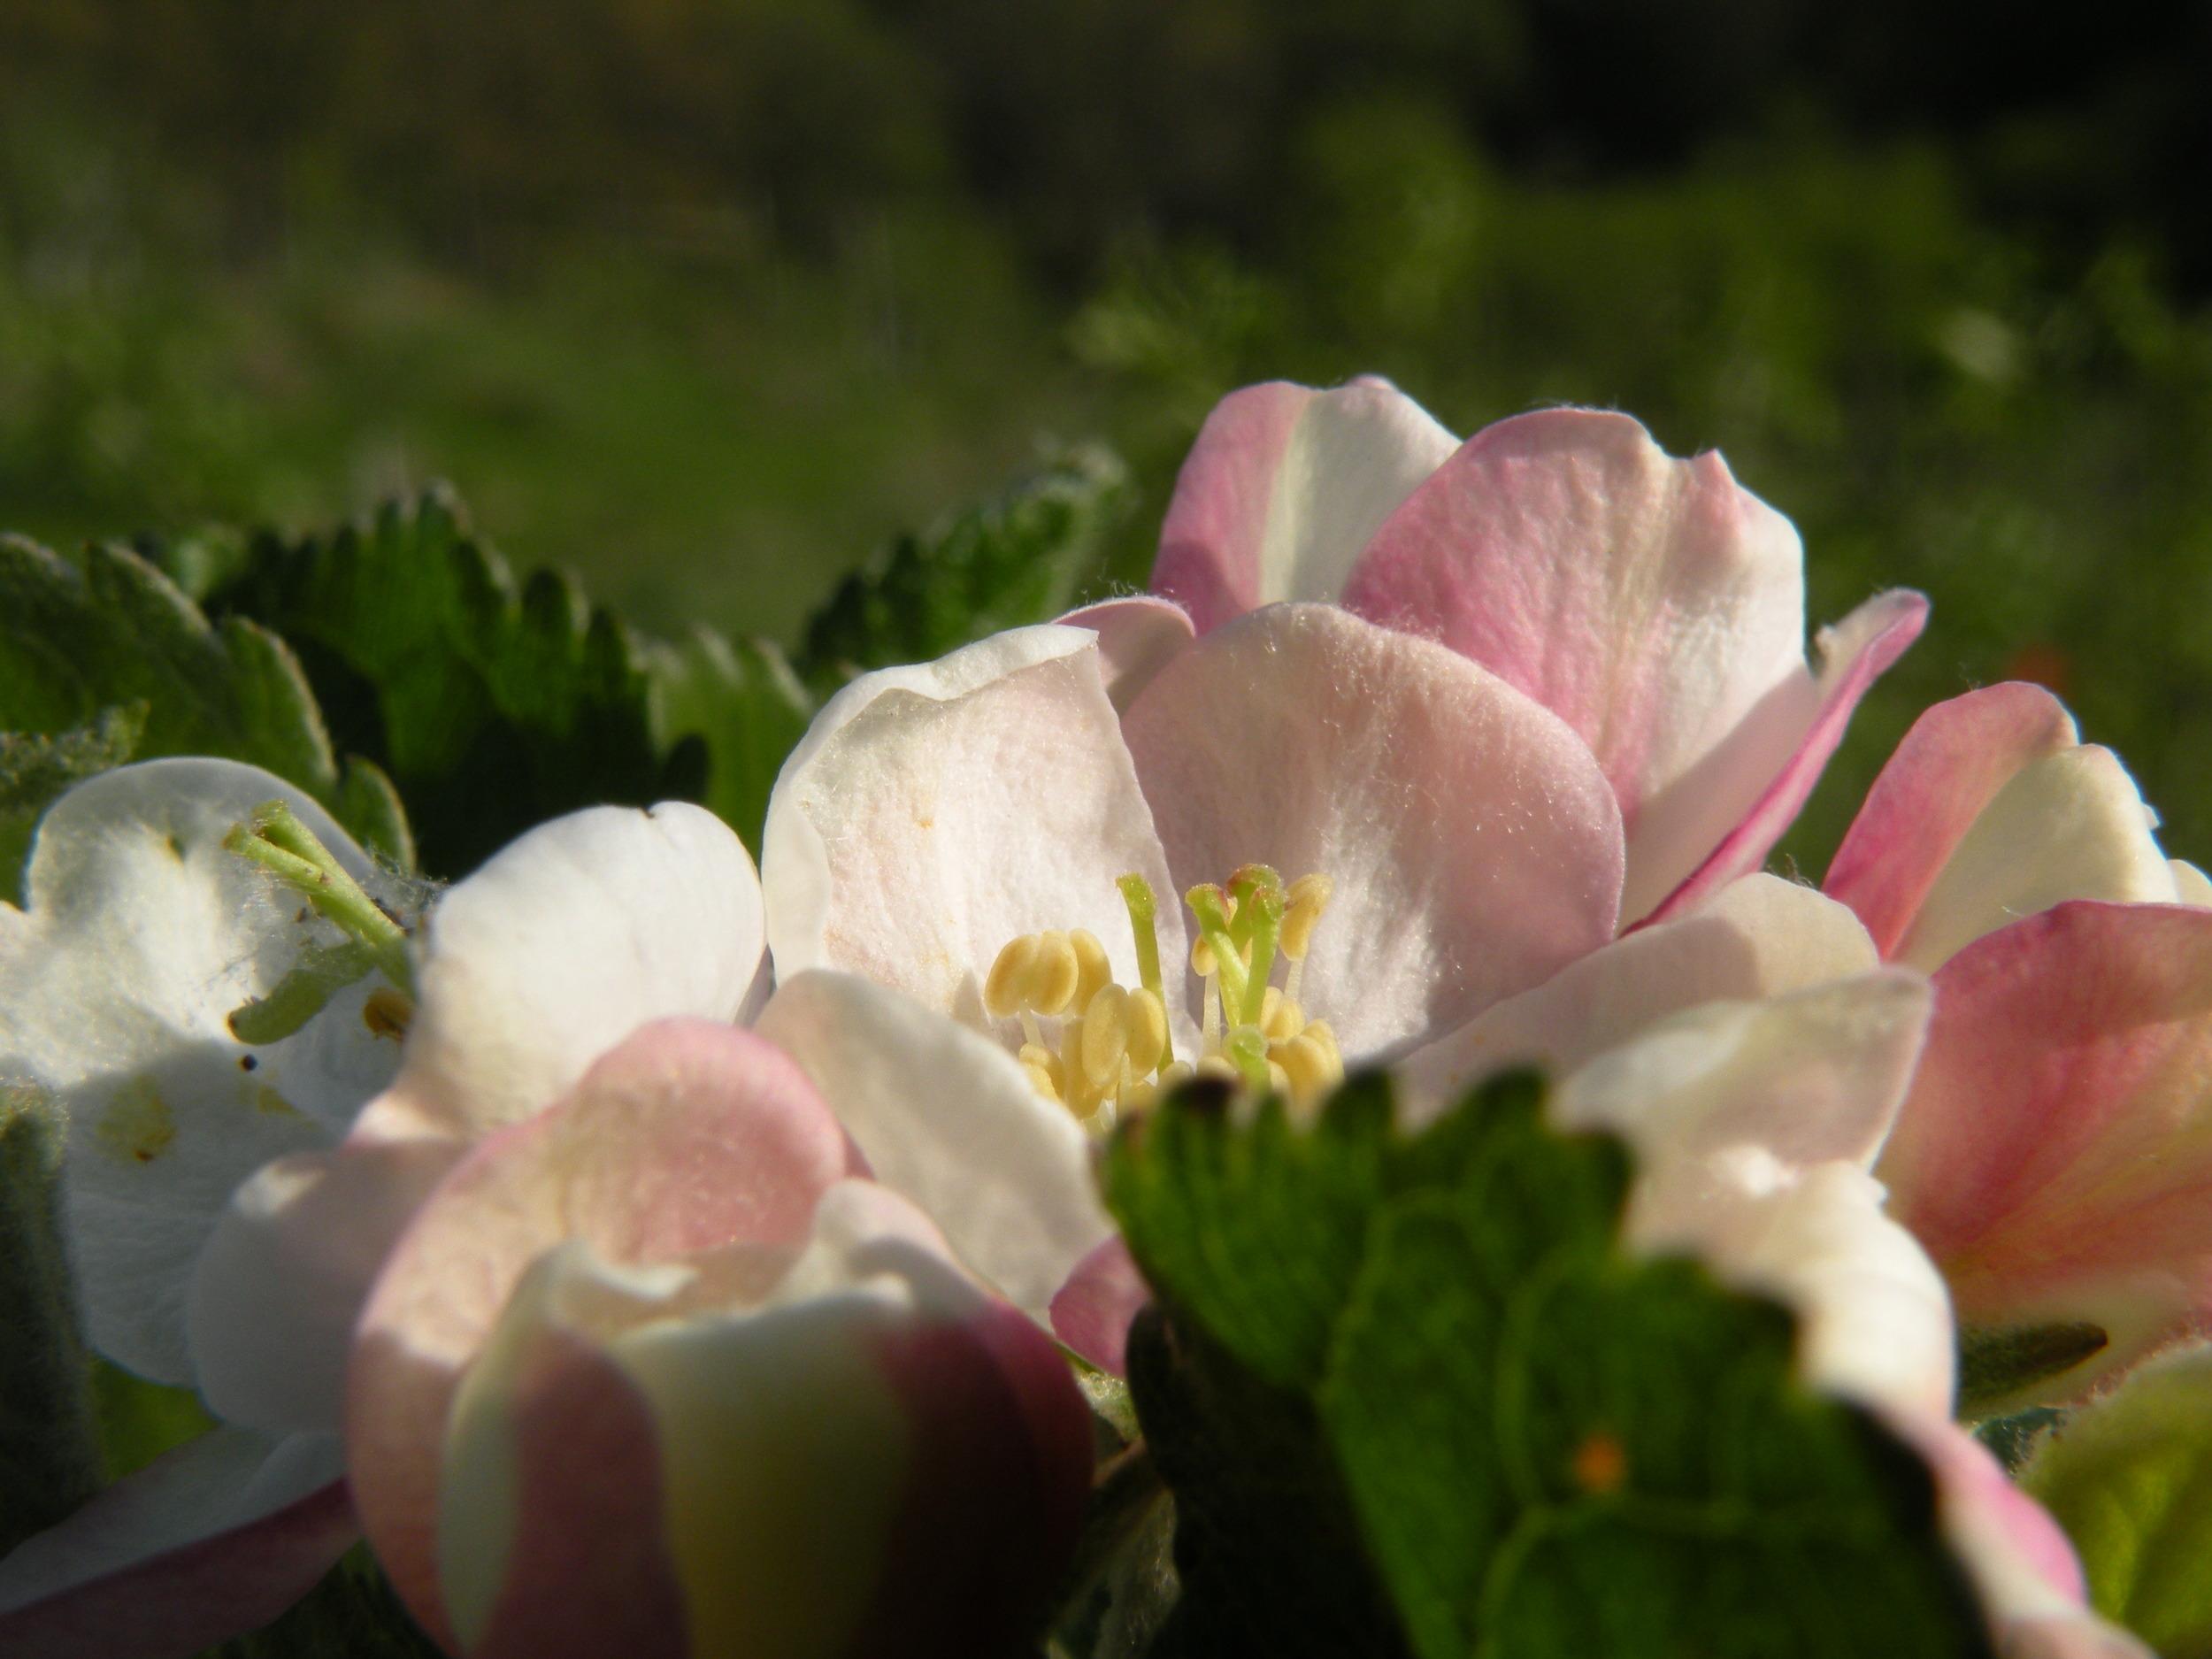 Apple blossoms unfolding